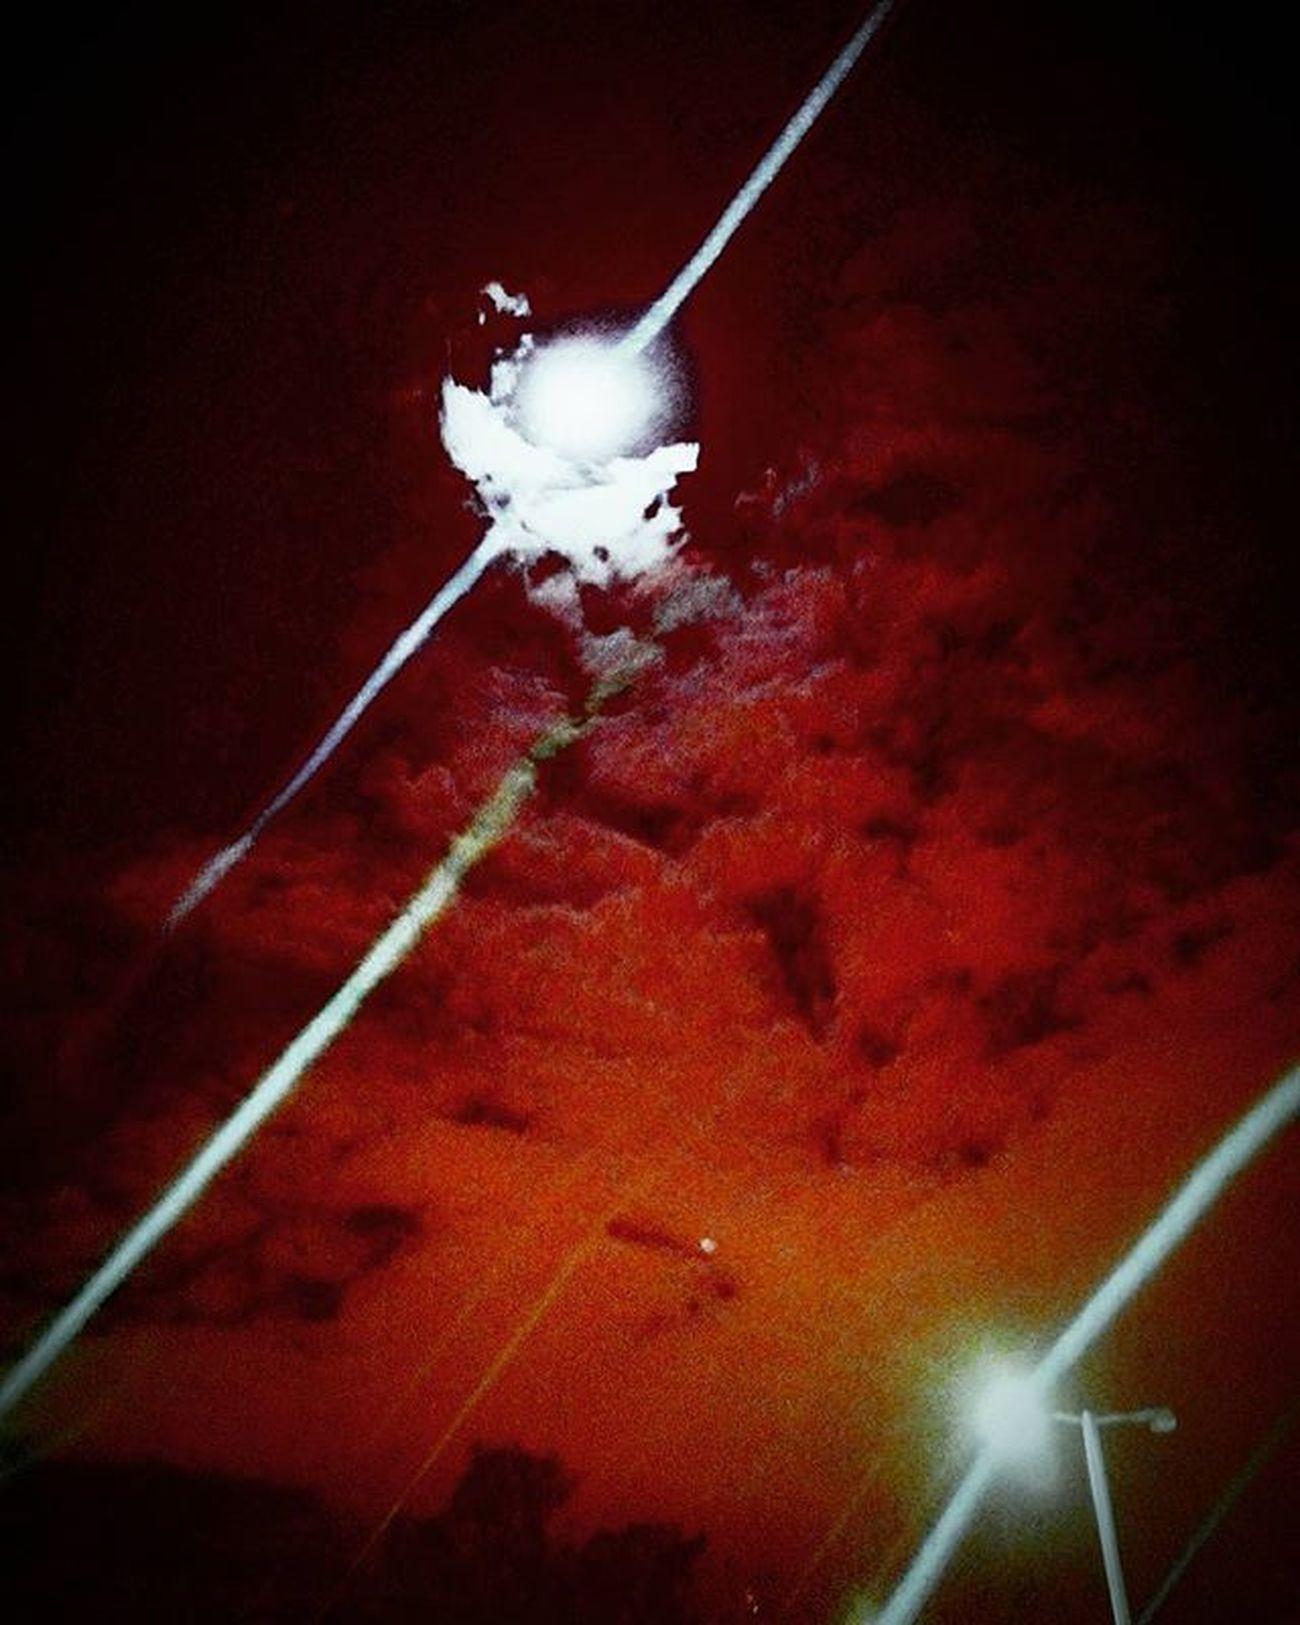 |•Sky on fire•|Midnight love•| 💜 | Marinafloisvou Falifornia φαληράκιαγαπημένο Backtoathens Nightlove Midnightlove Sky Red Clouds Fullmoon Amazingview Myviewrightnow Loveisallaroundus Breath Dream Love VSCO Vscocam Vscolove Vscomidnight Vscoathens Vscogreece Vscoaddict Instagreece Instaathens instalove instamood instaaddict instalifo